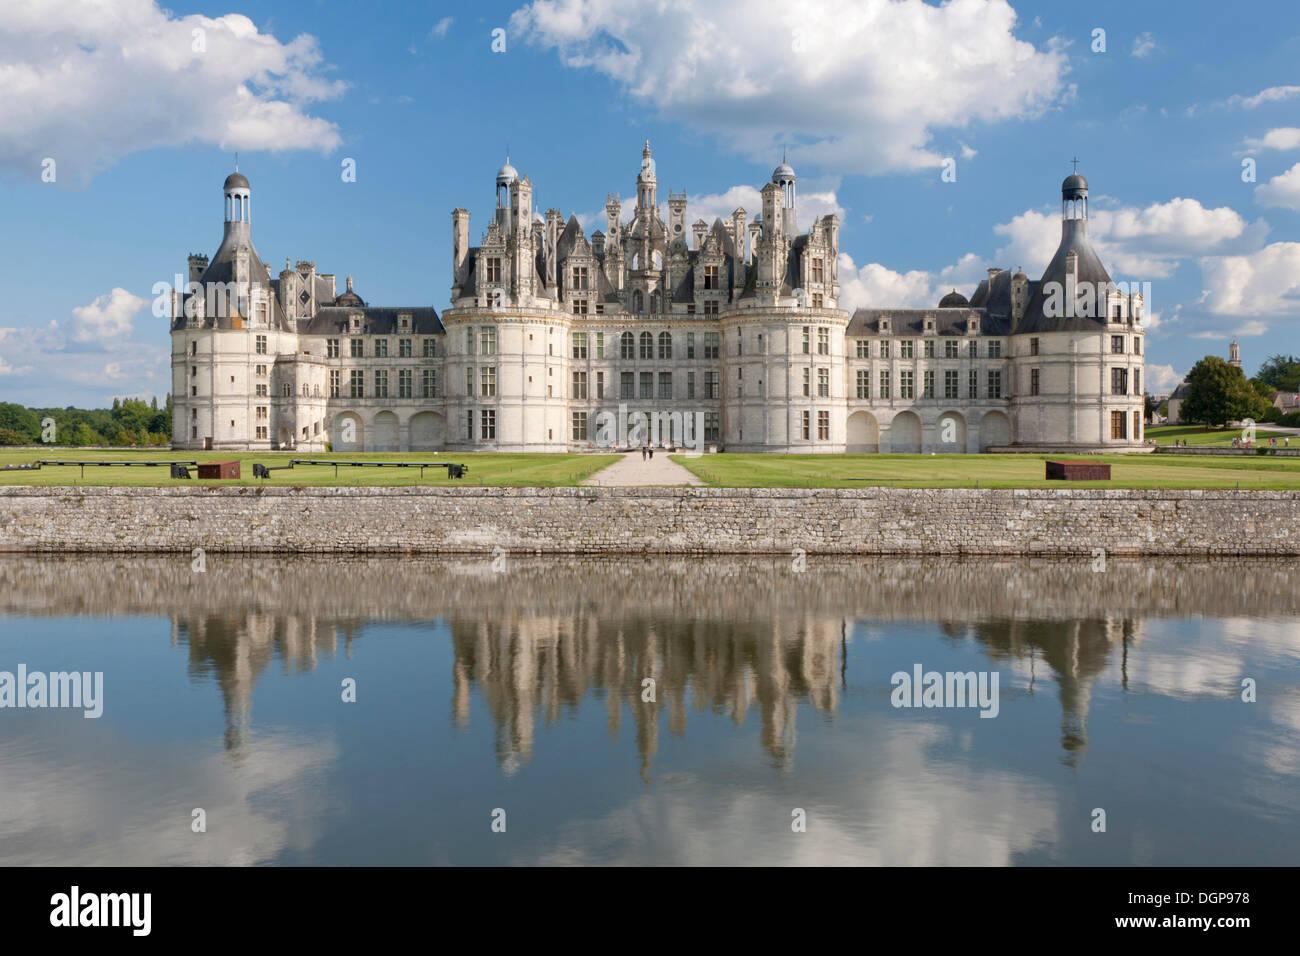 Château de Chambord, north facade with a moat, department of Loire et Cher, Centre region, France, Europe - Stock Image